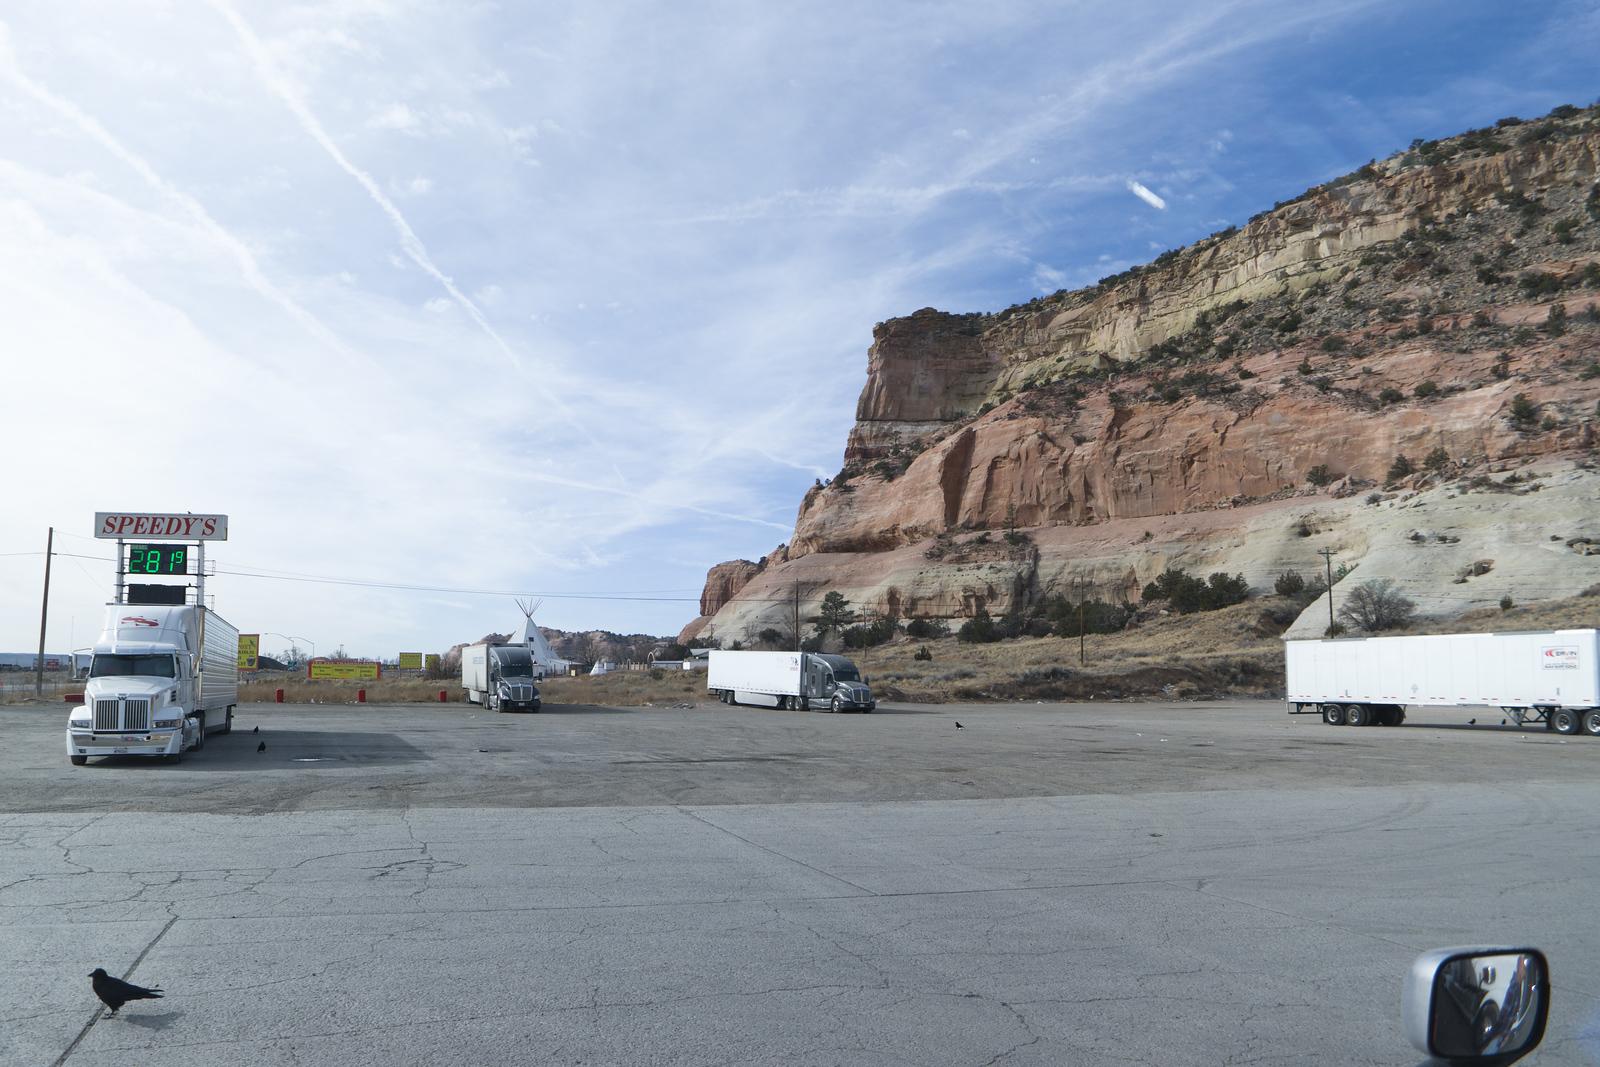 Speedy's Truck Stop - Lupton, AZ